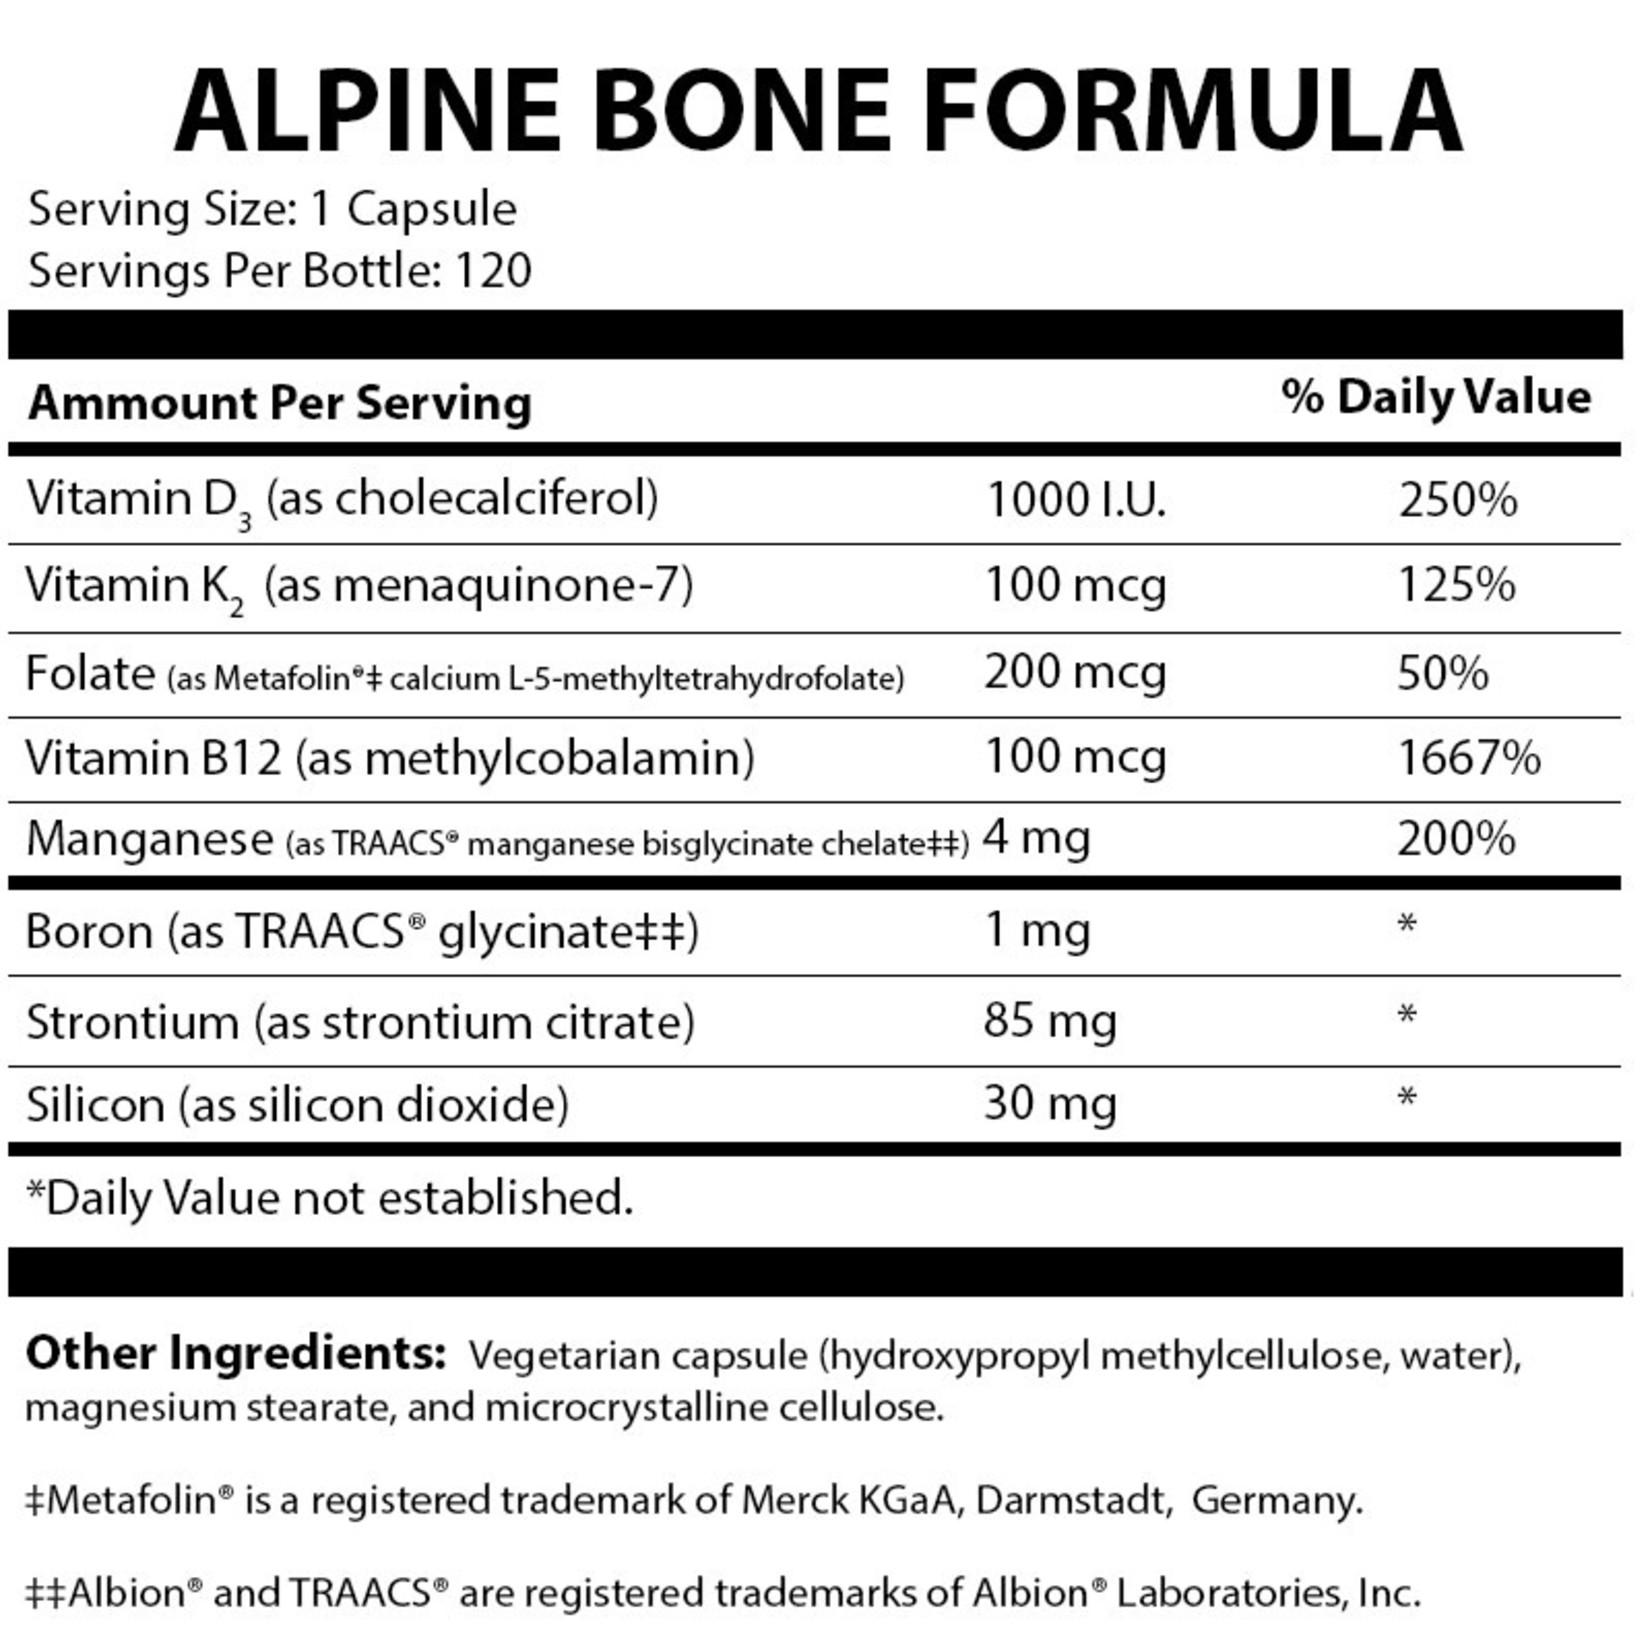 Alpine Clinic Private Label Alpine Bone Formula